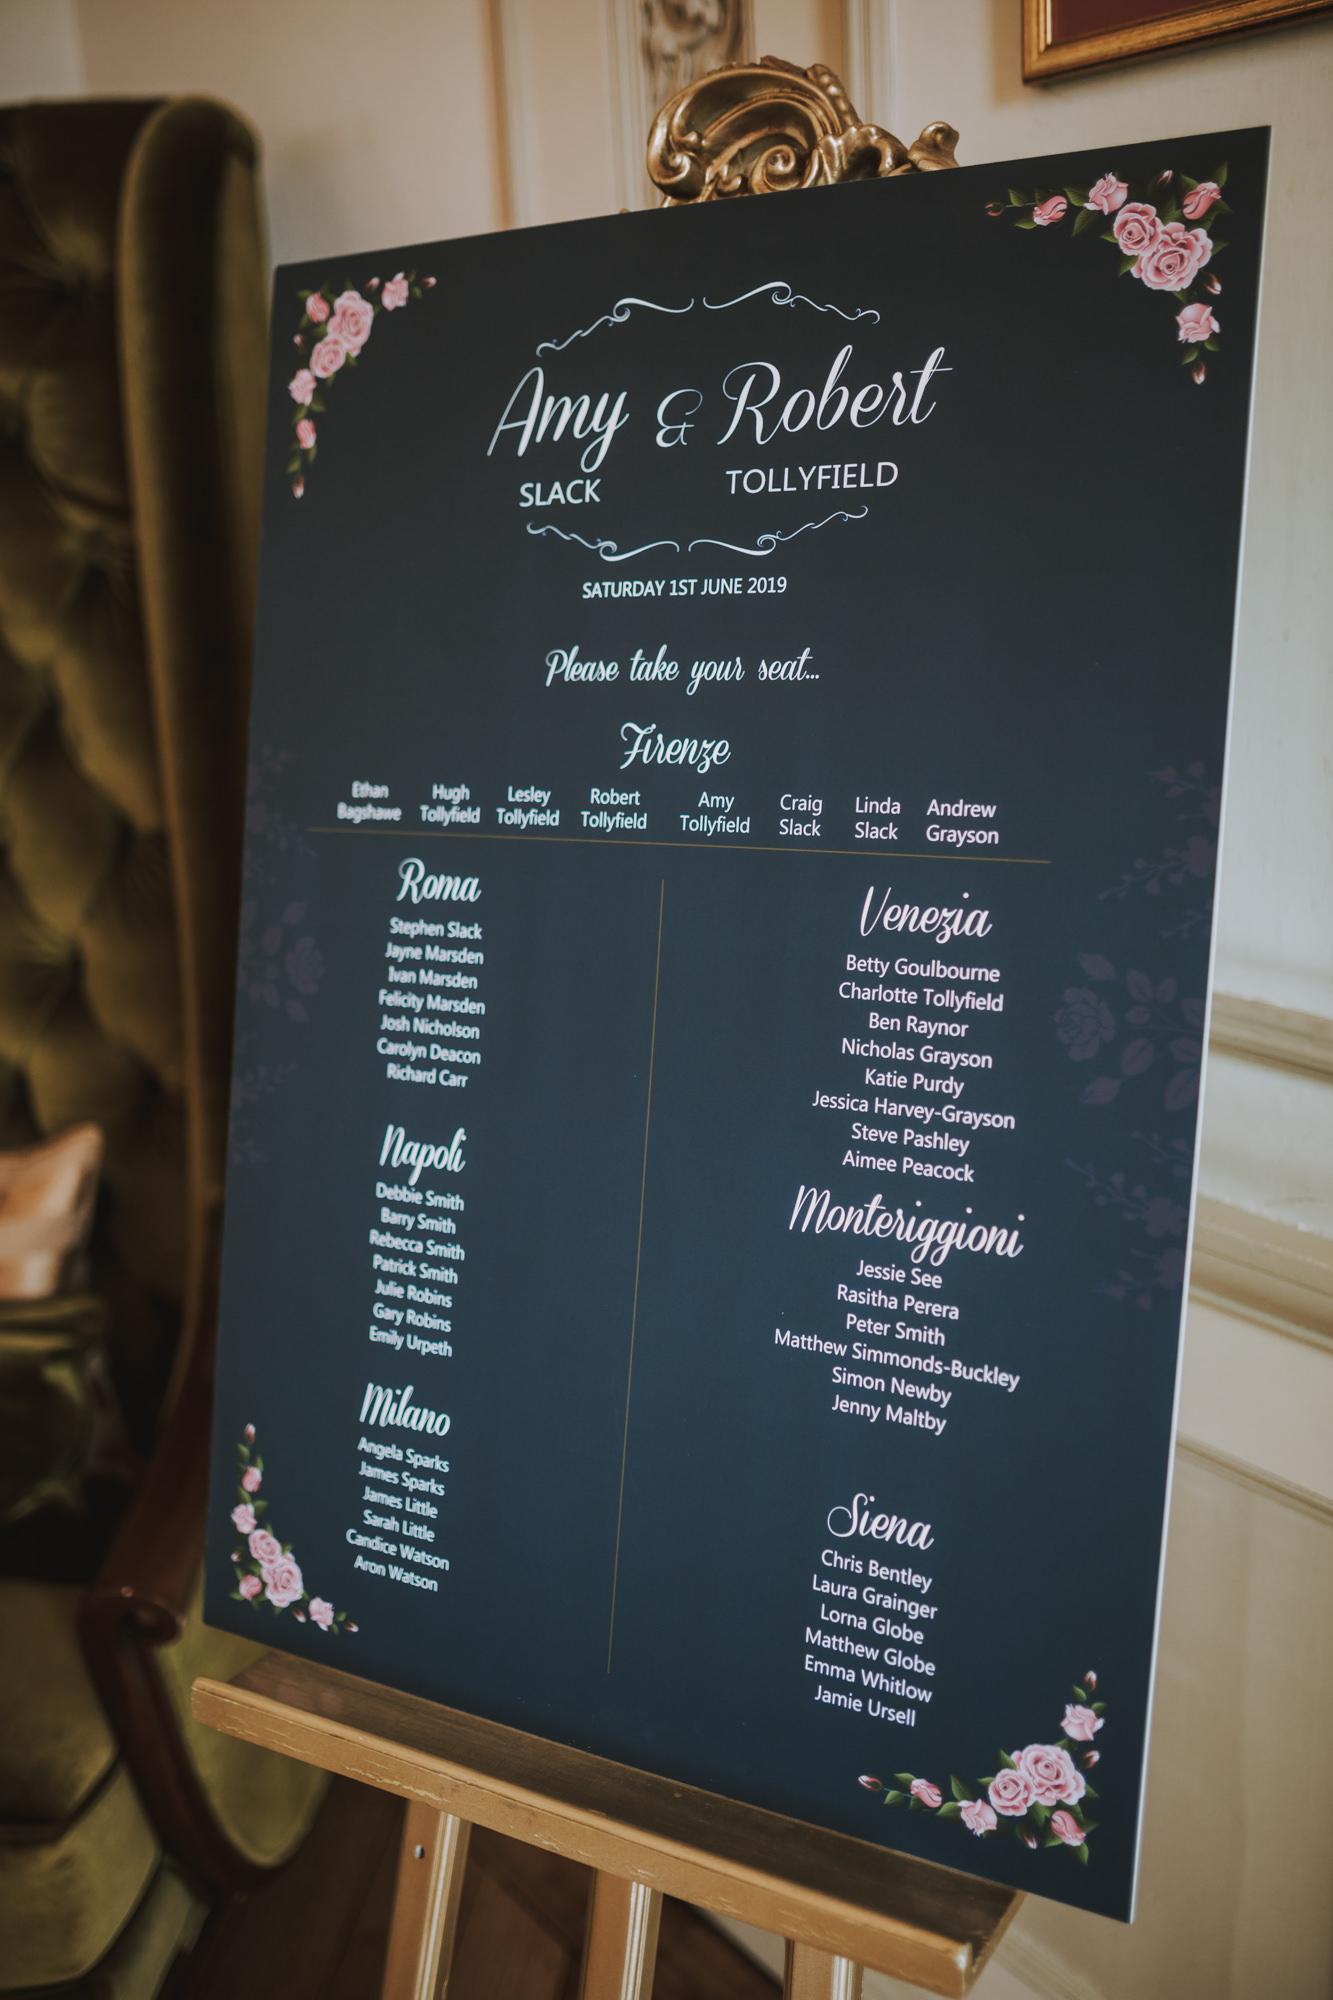 hodsock priory wedding photographers blog3.jpg